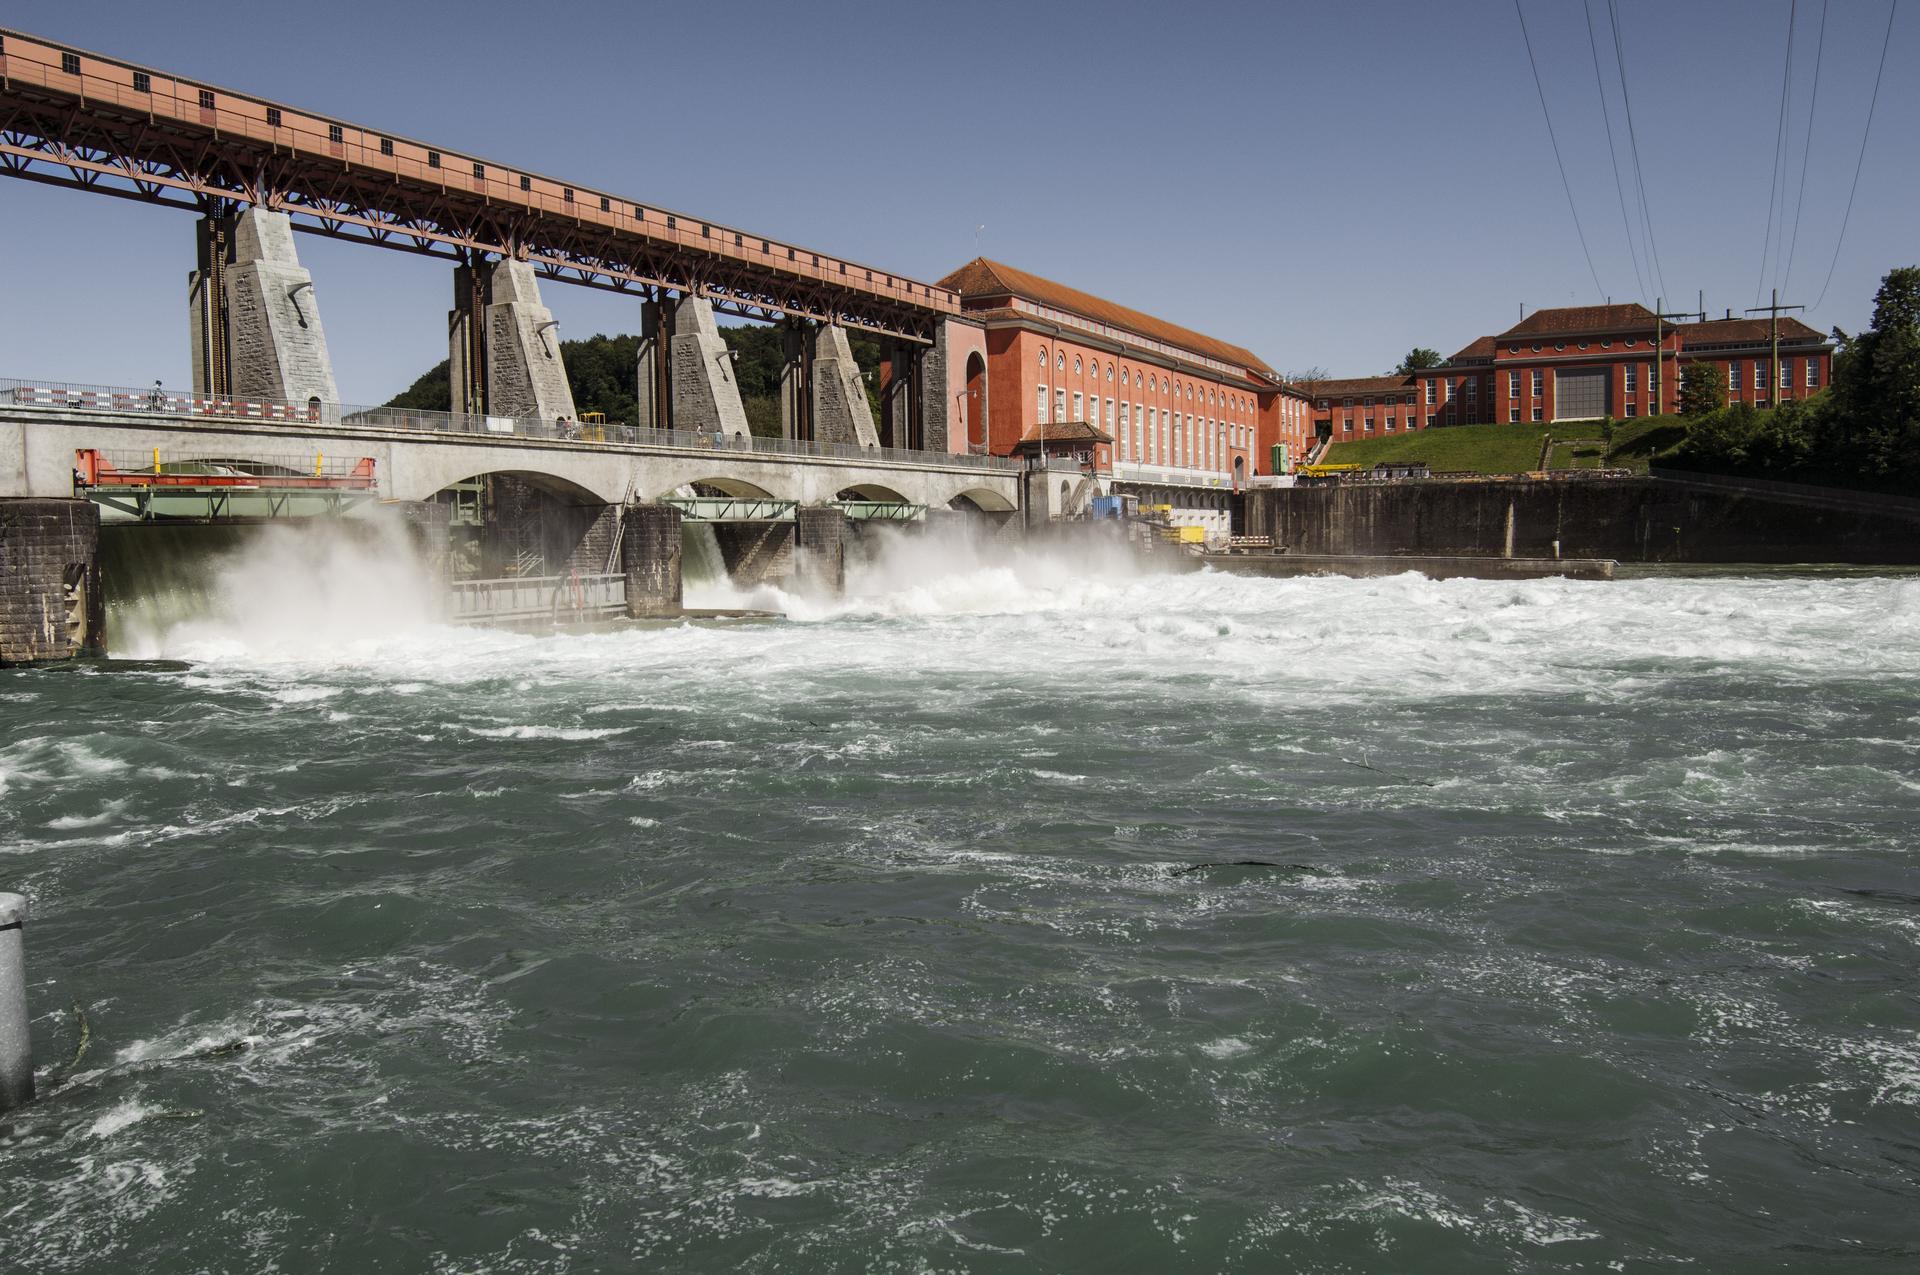 Eglisau-Glattfelden hydropower